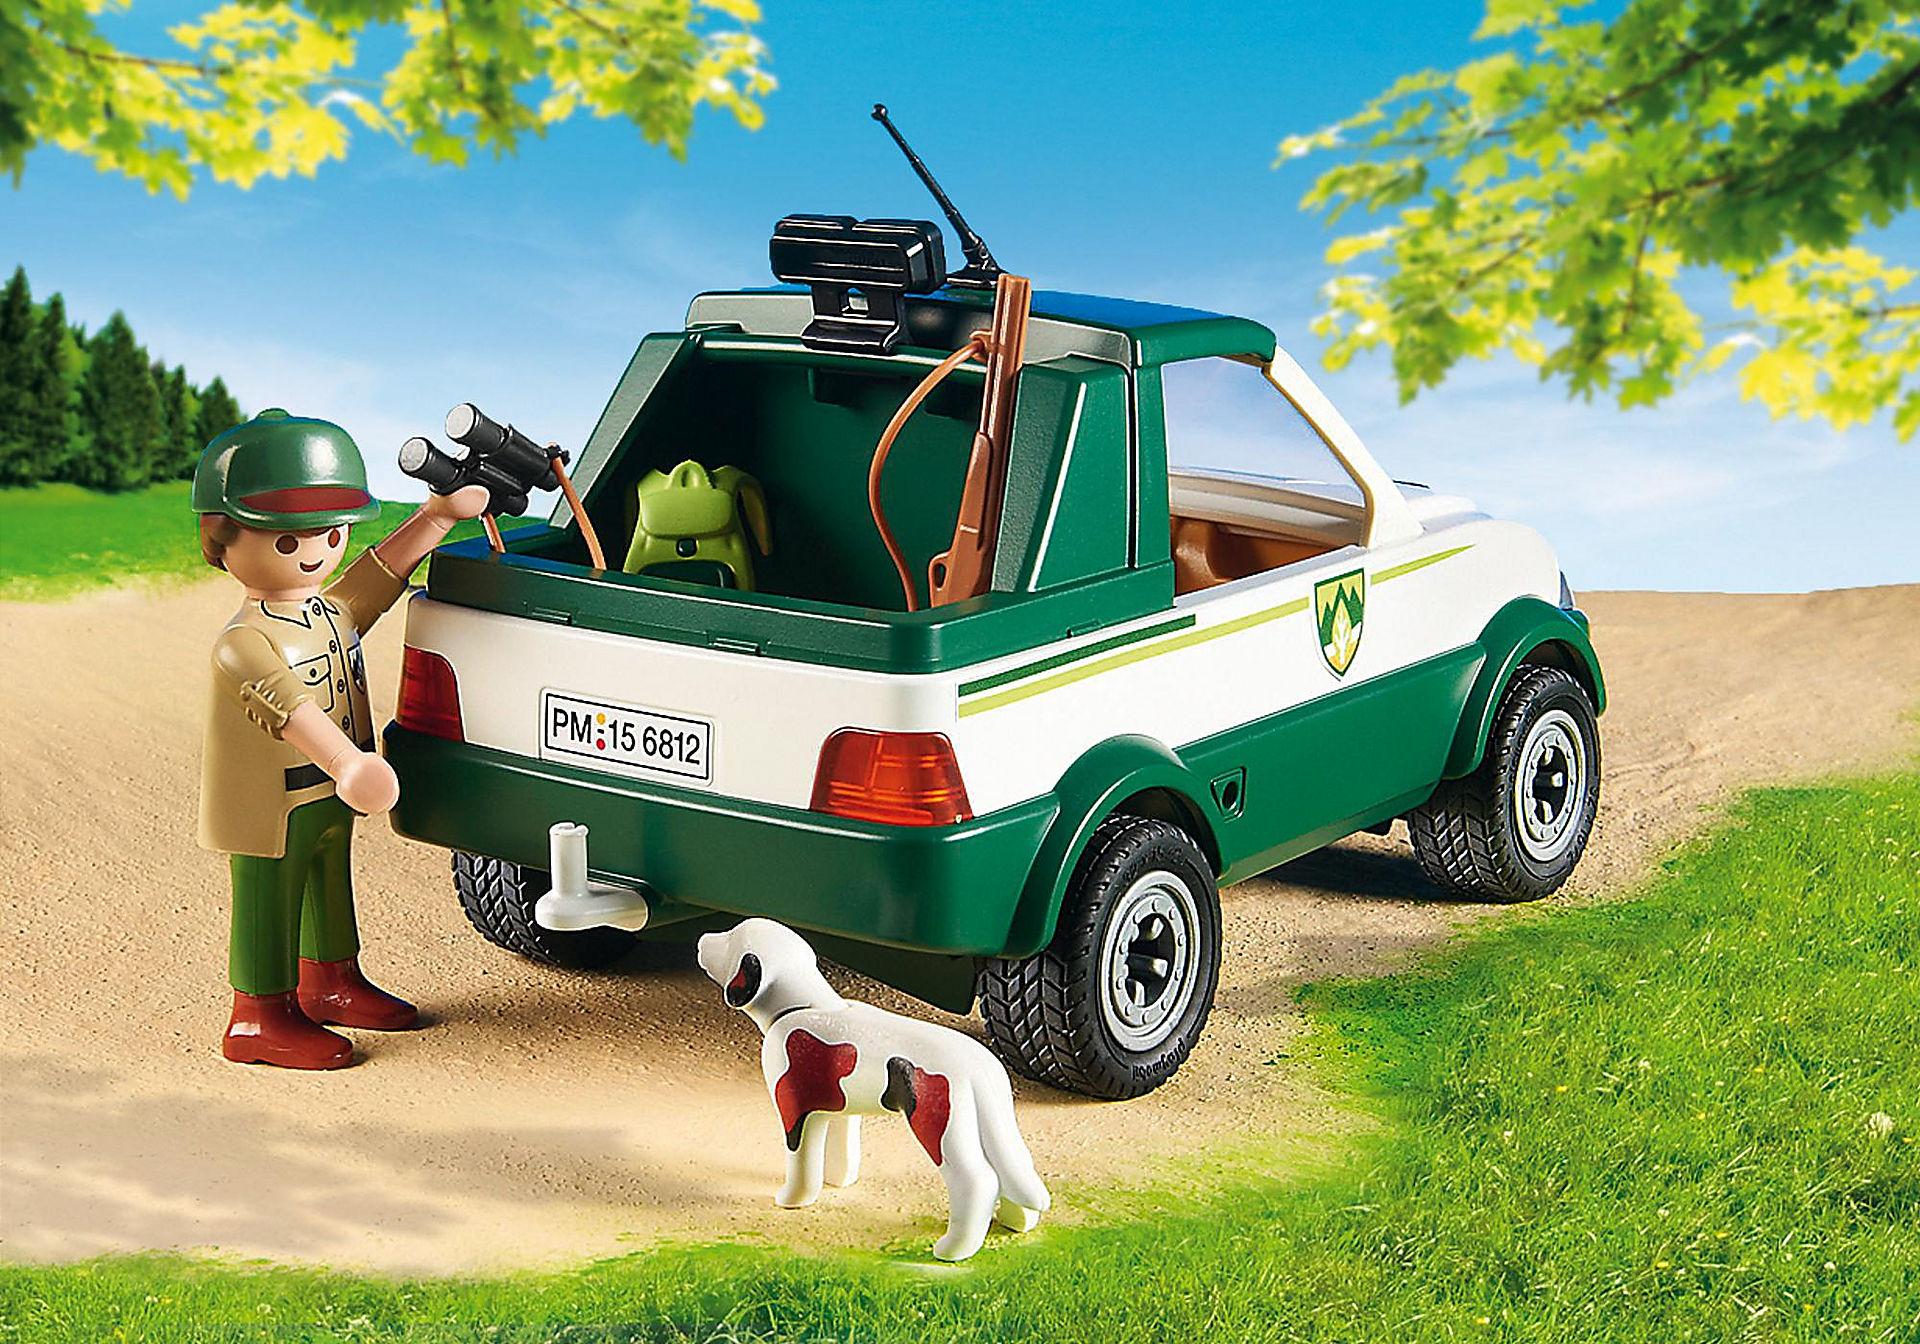 http://media.playmobil.com/i/playmobil/6812_product_extra1/Garde forestier avec pick-up